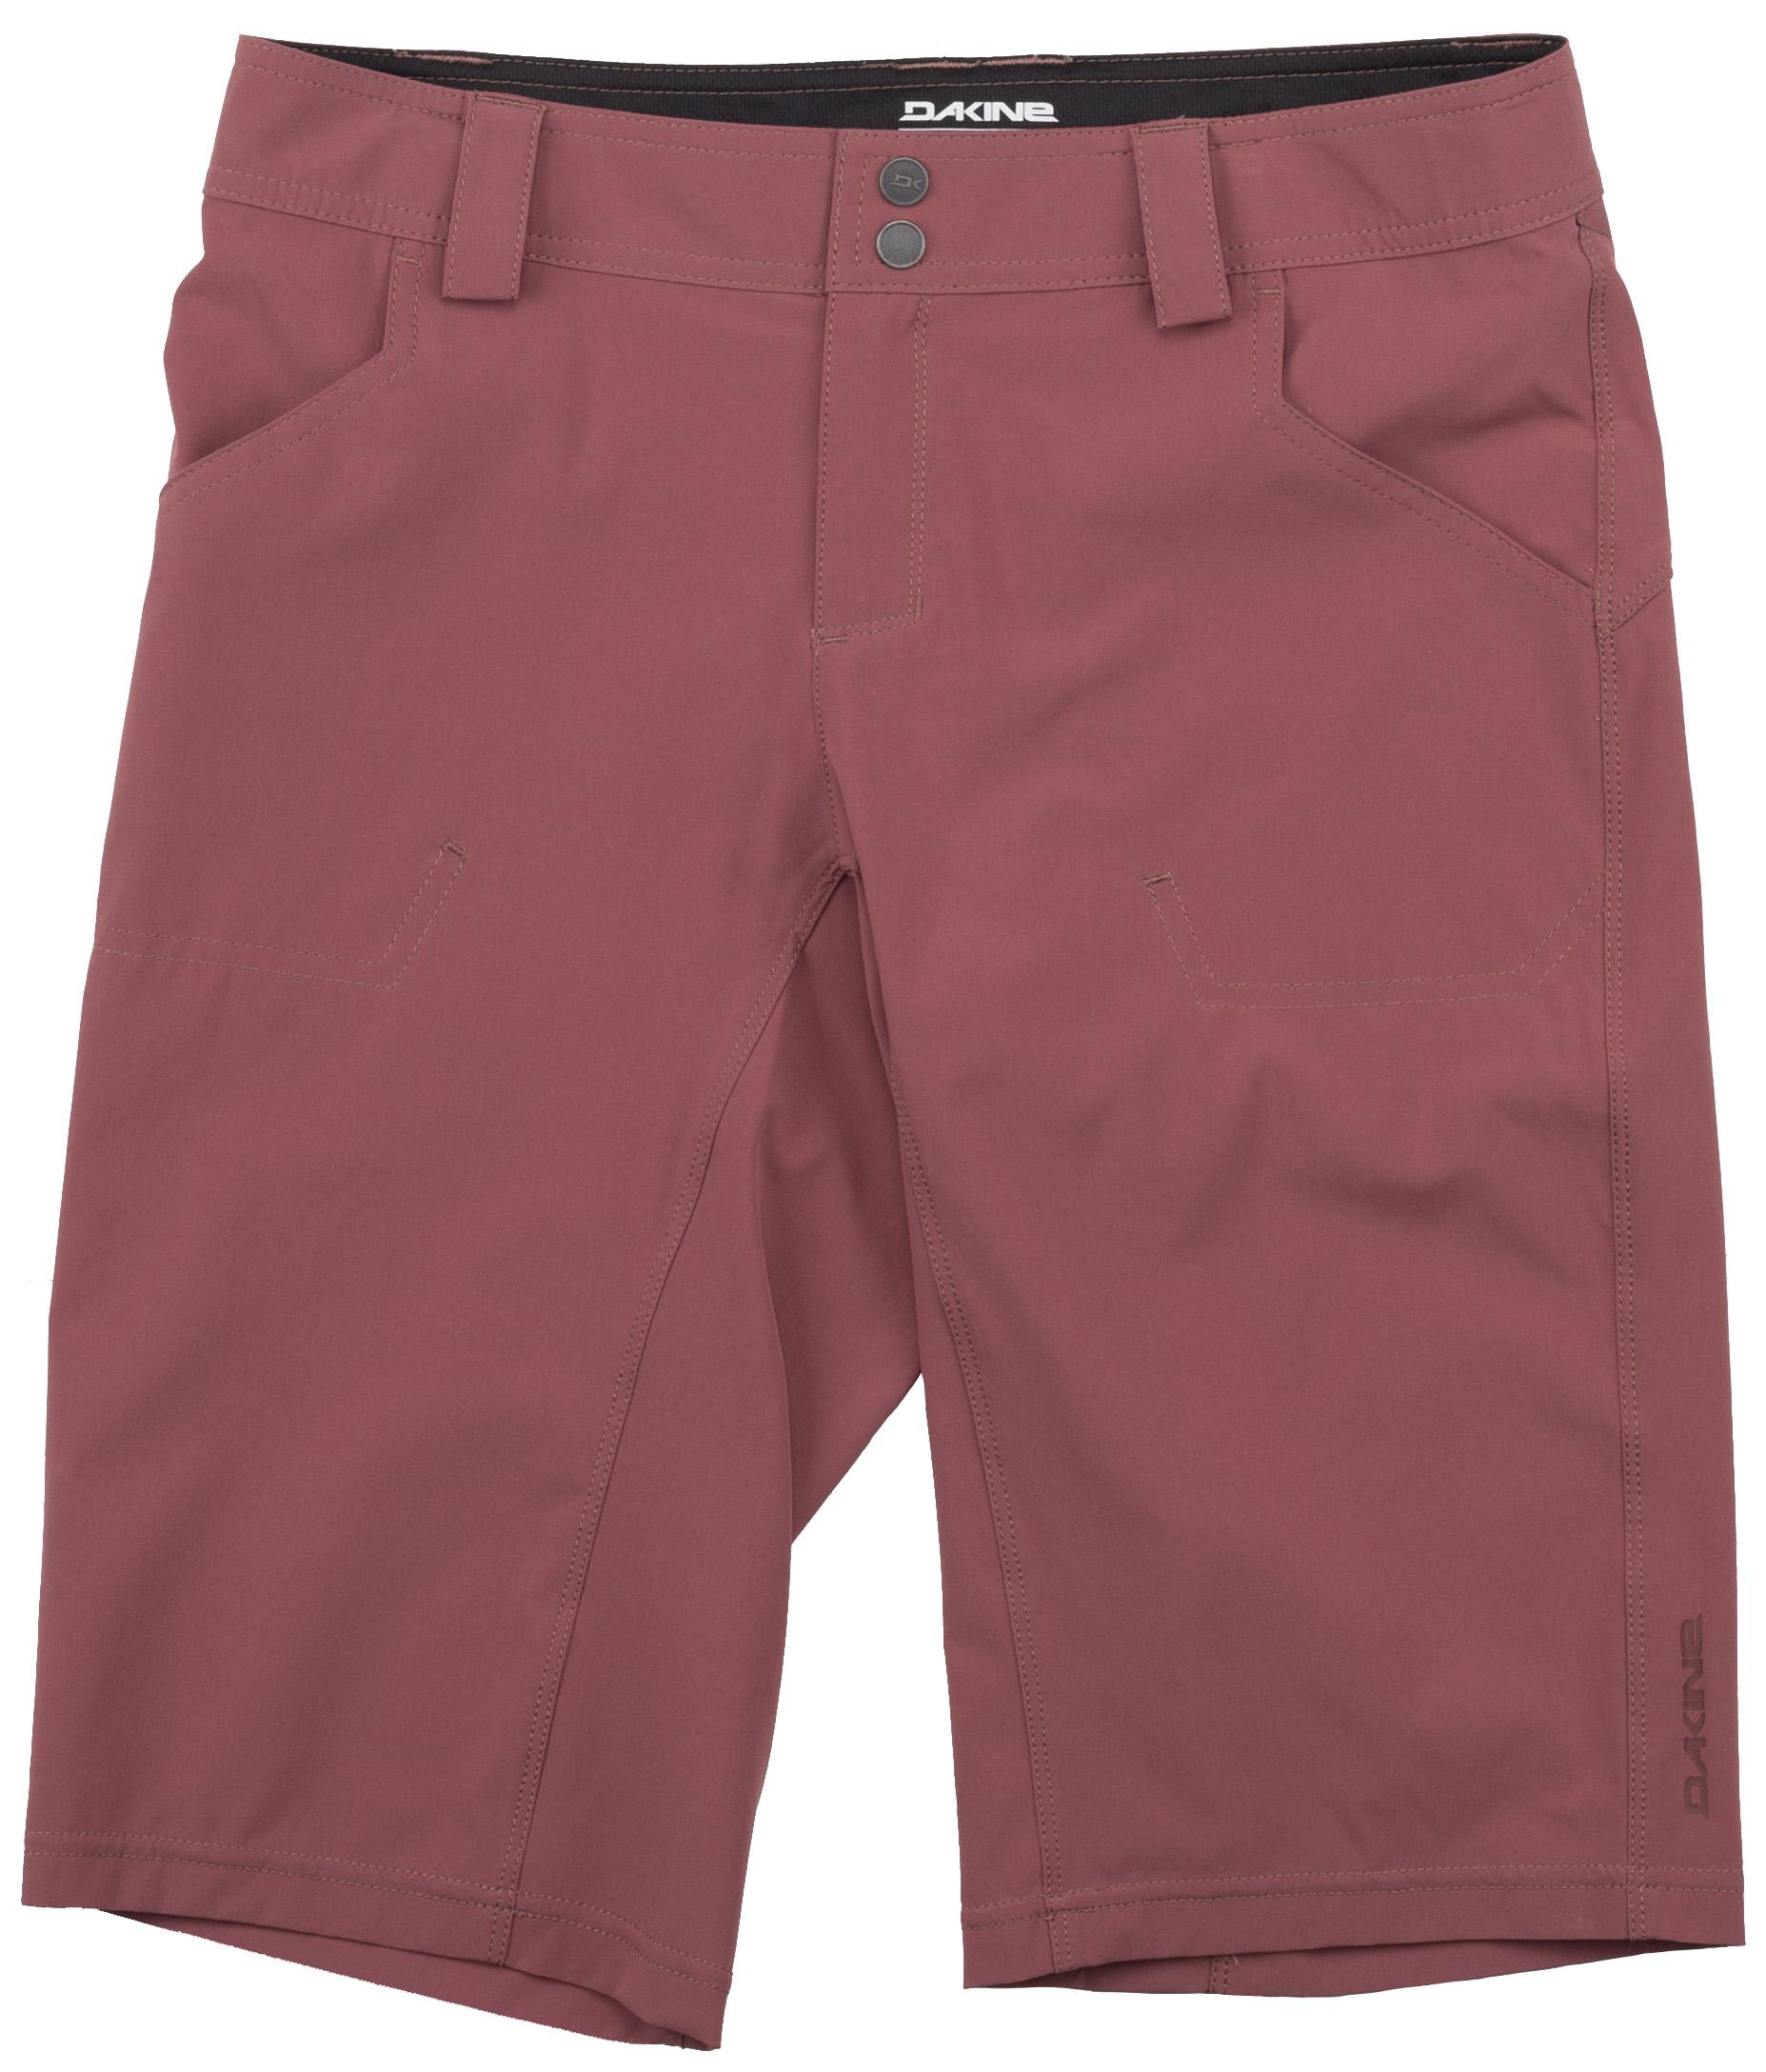 Dakine Cadence W/Liner Wmns MTB Shorts